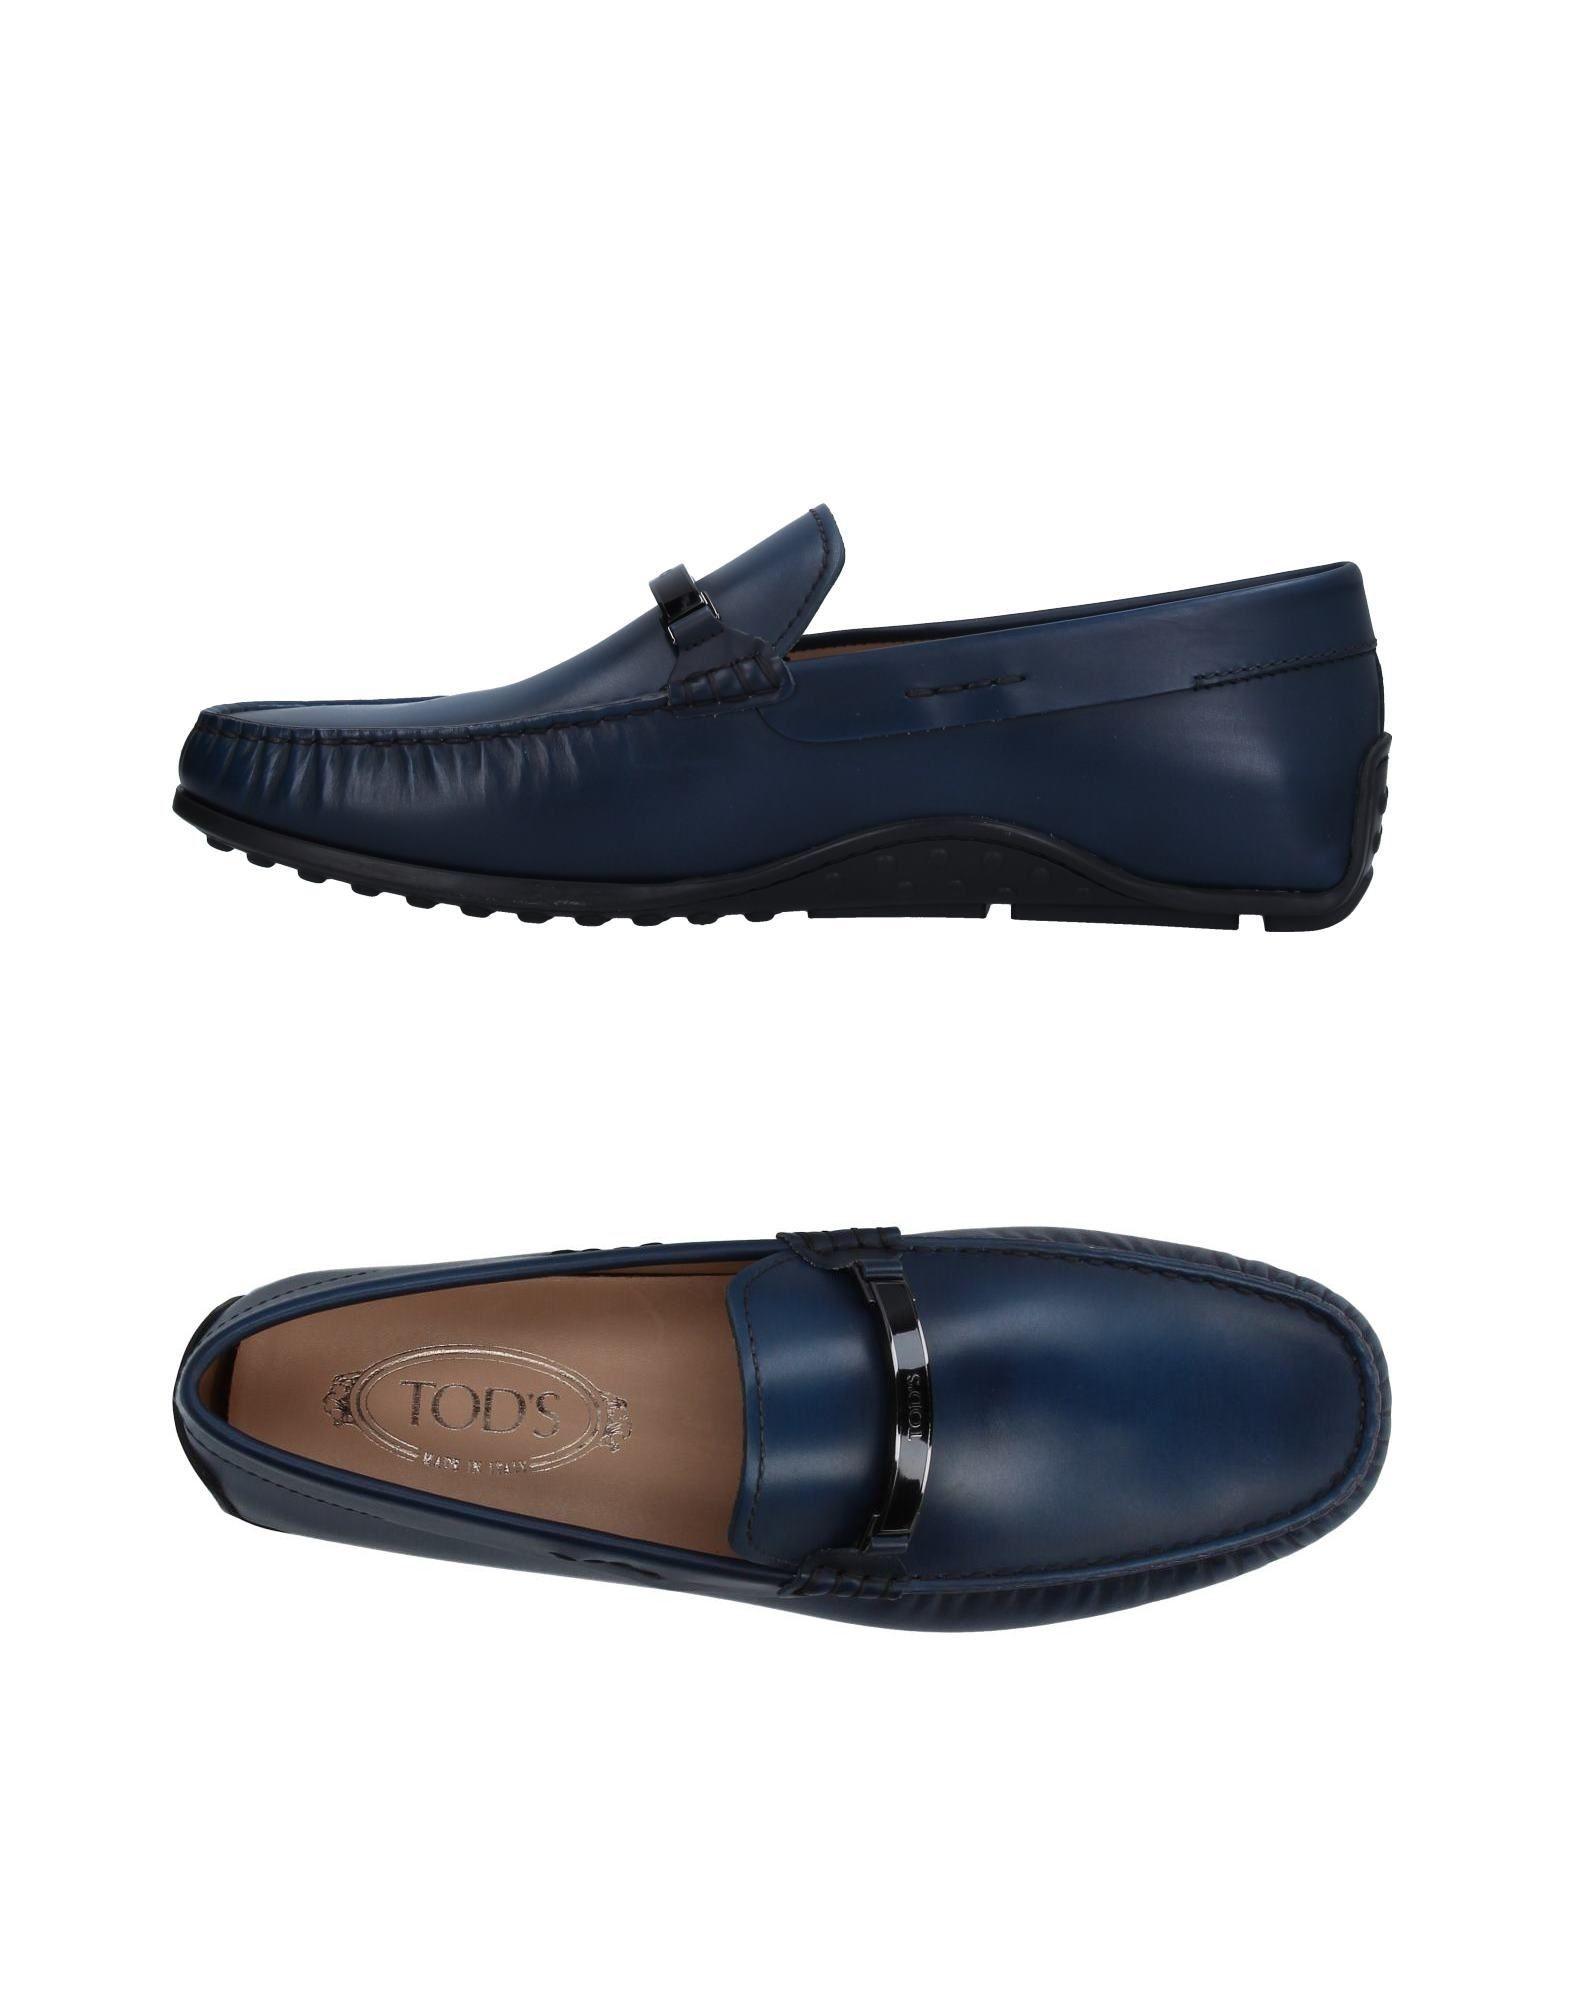 Tod's Mokassins Herren  11298807WW Gute Qualität beliebte Schuhe